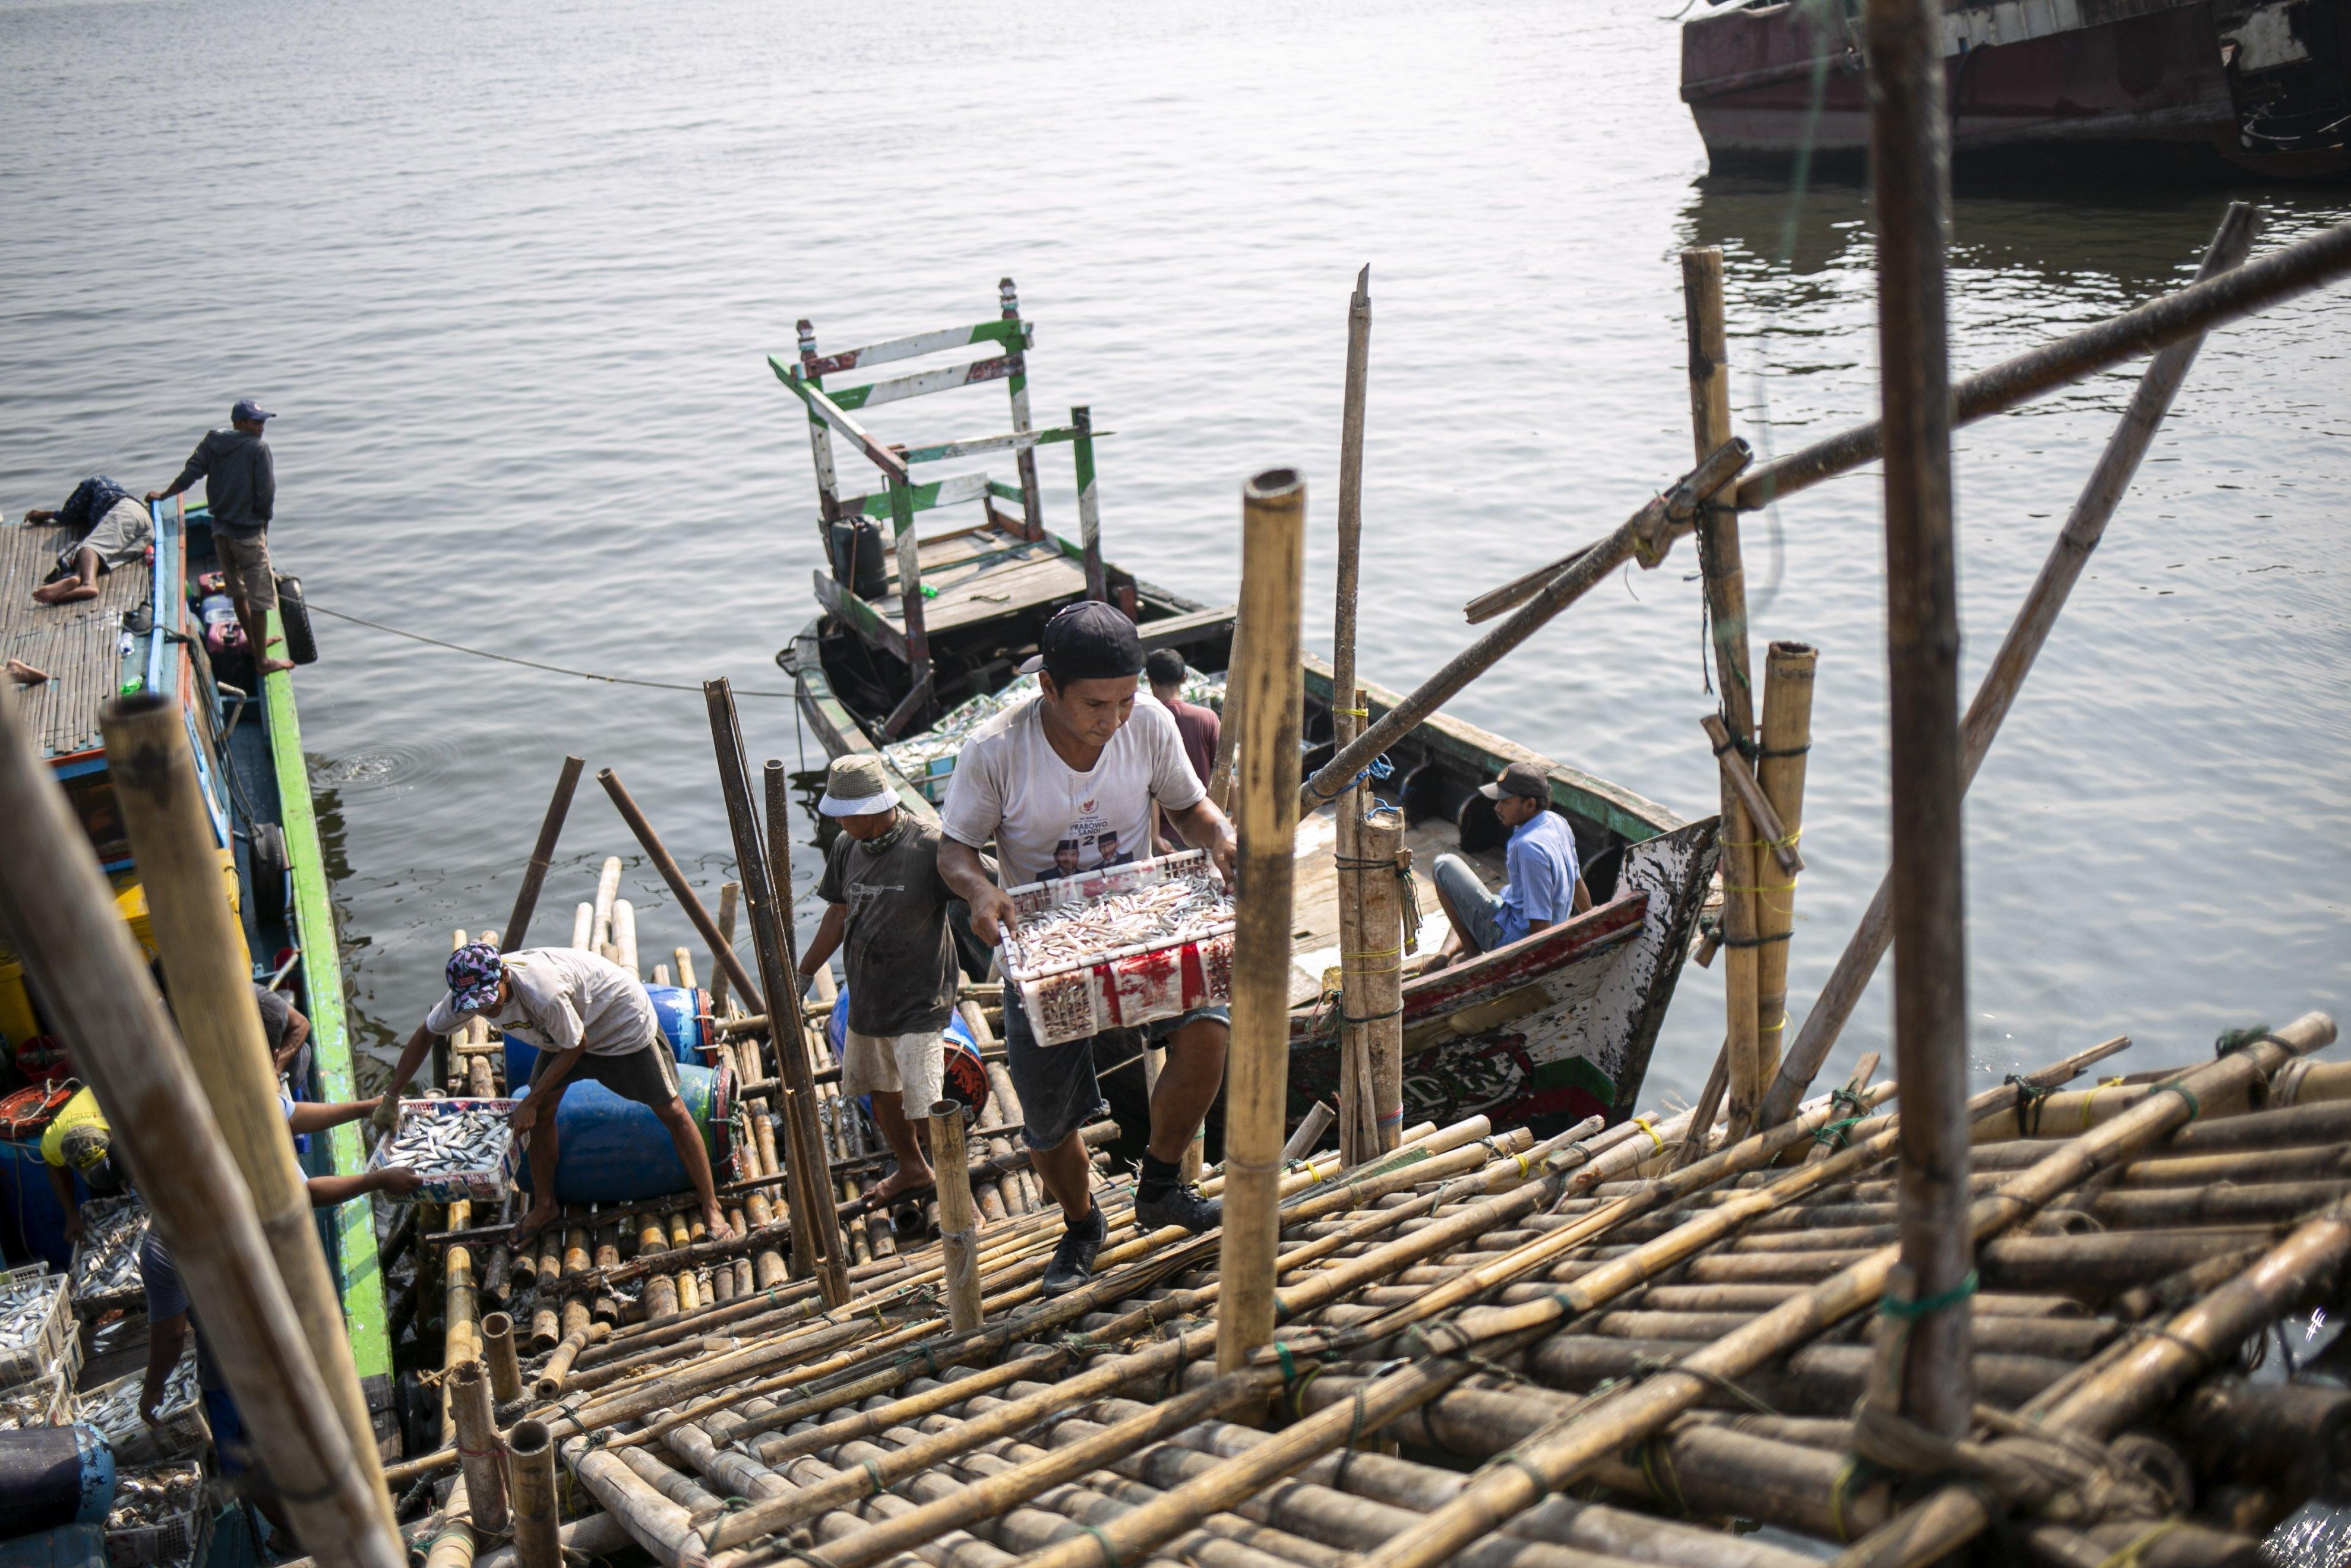 Sejumlah nelayan mengangkat ikan hasil tangkapan di Kampung Nelayan, Jakarta Utara, Minggu (9/8/2020). Kesatuan Nelayan Tradisional Indonesia (KNTI) mengklaim penurunan penjualan tangkapan nelayan mencapai 21 persen dan pendapatan hingga 90 persen akibat merebaknya virus covid-19.